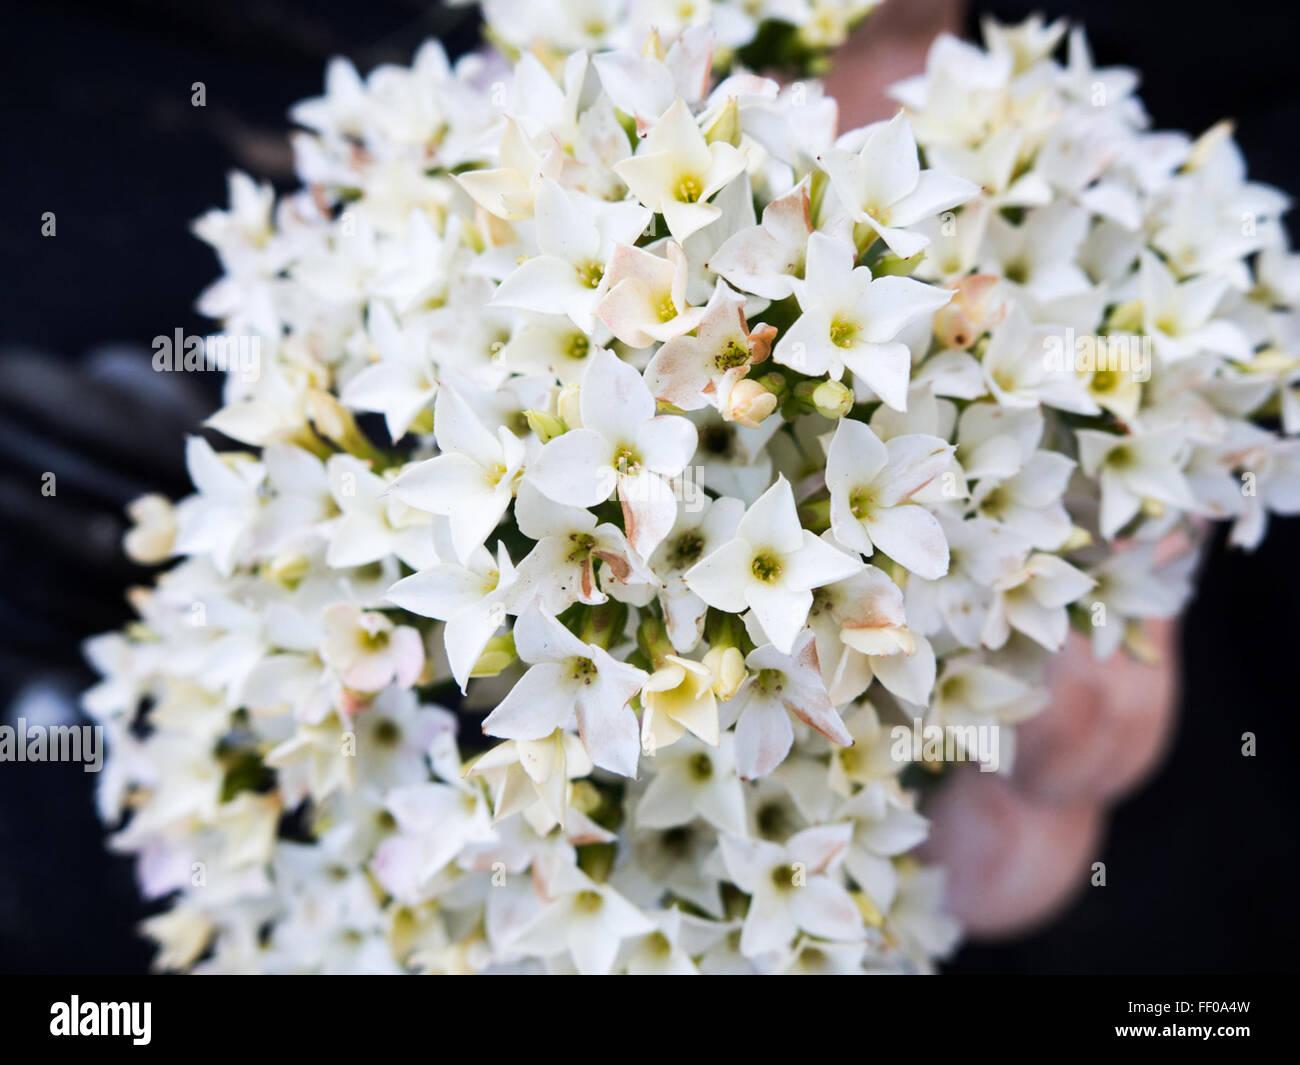 Small White Puff Ball Flowers